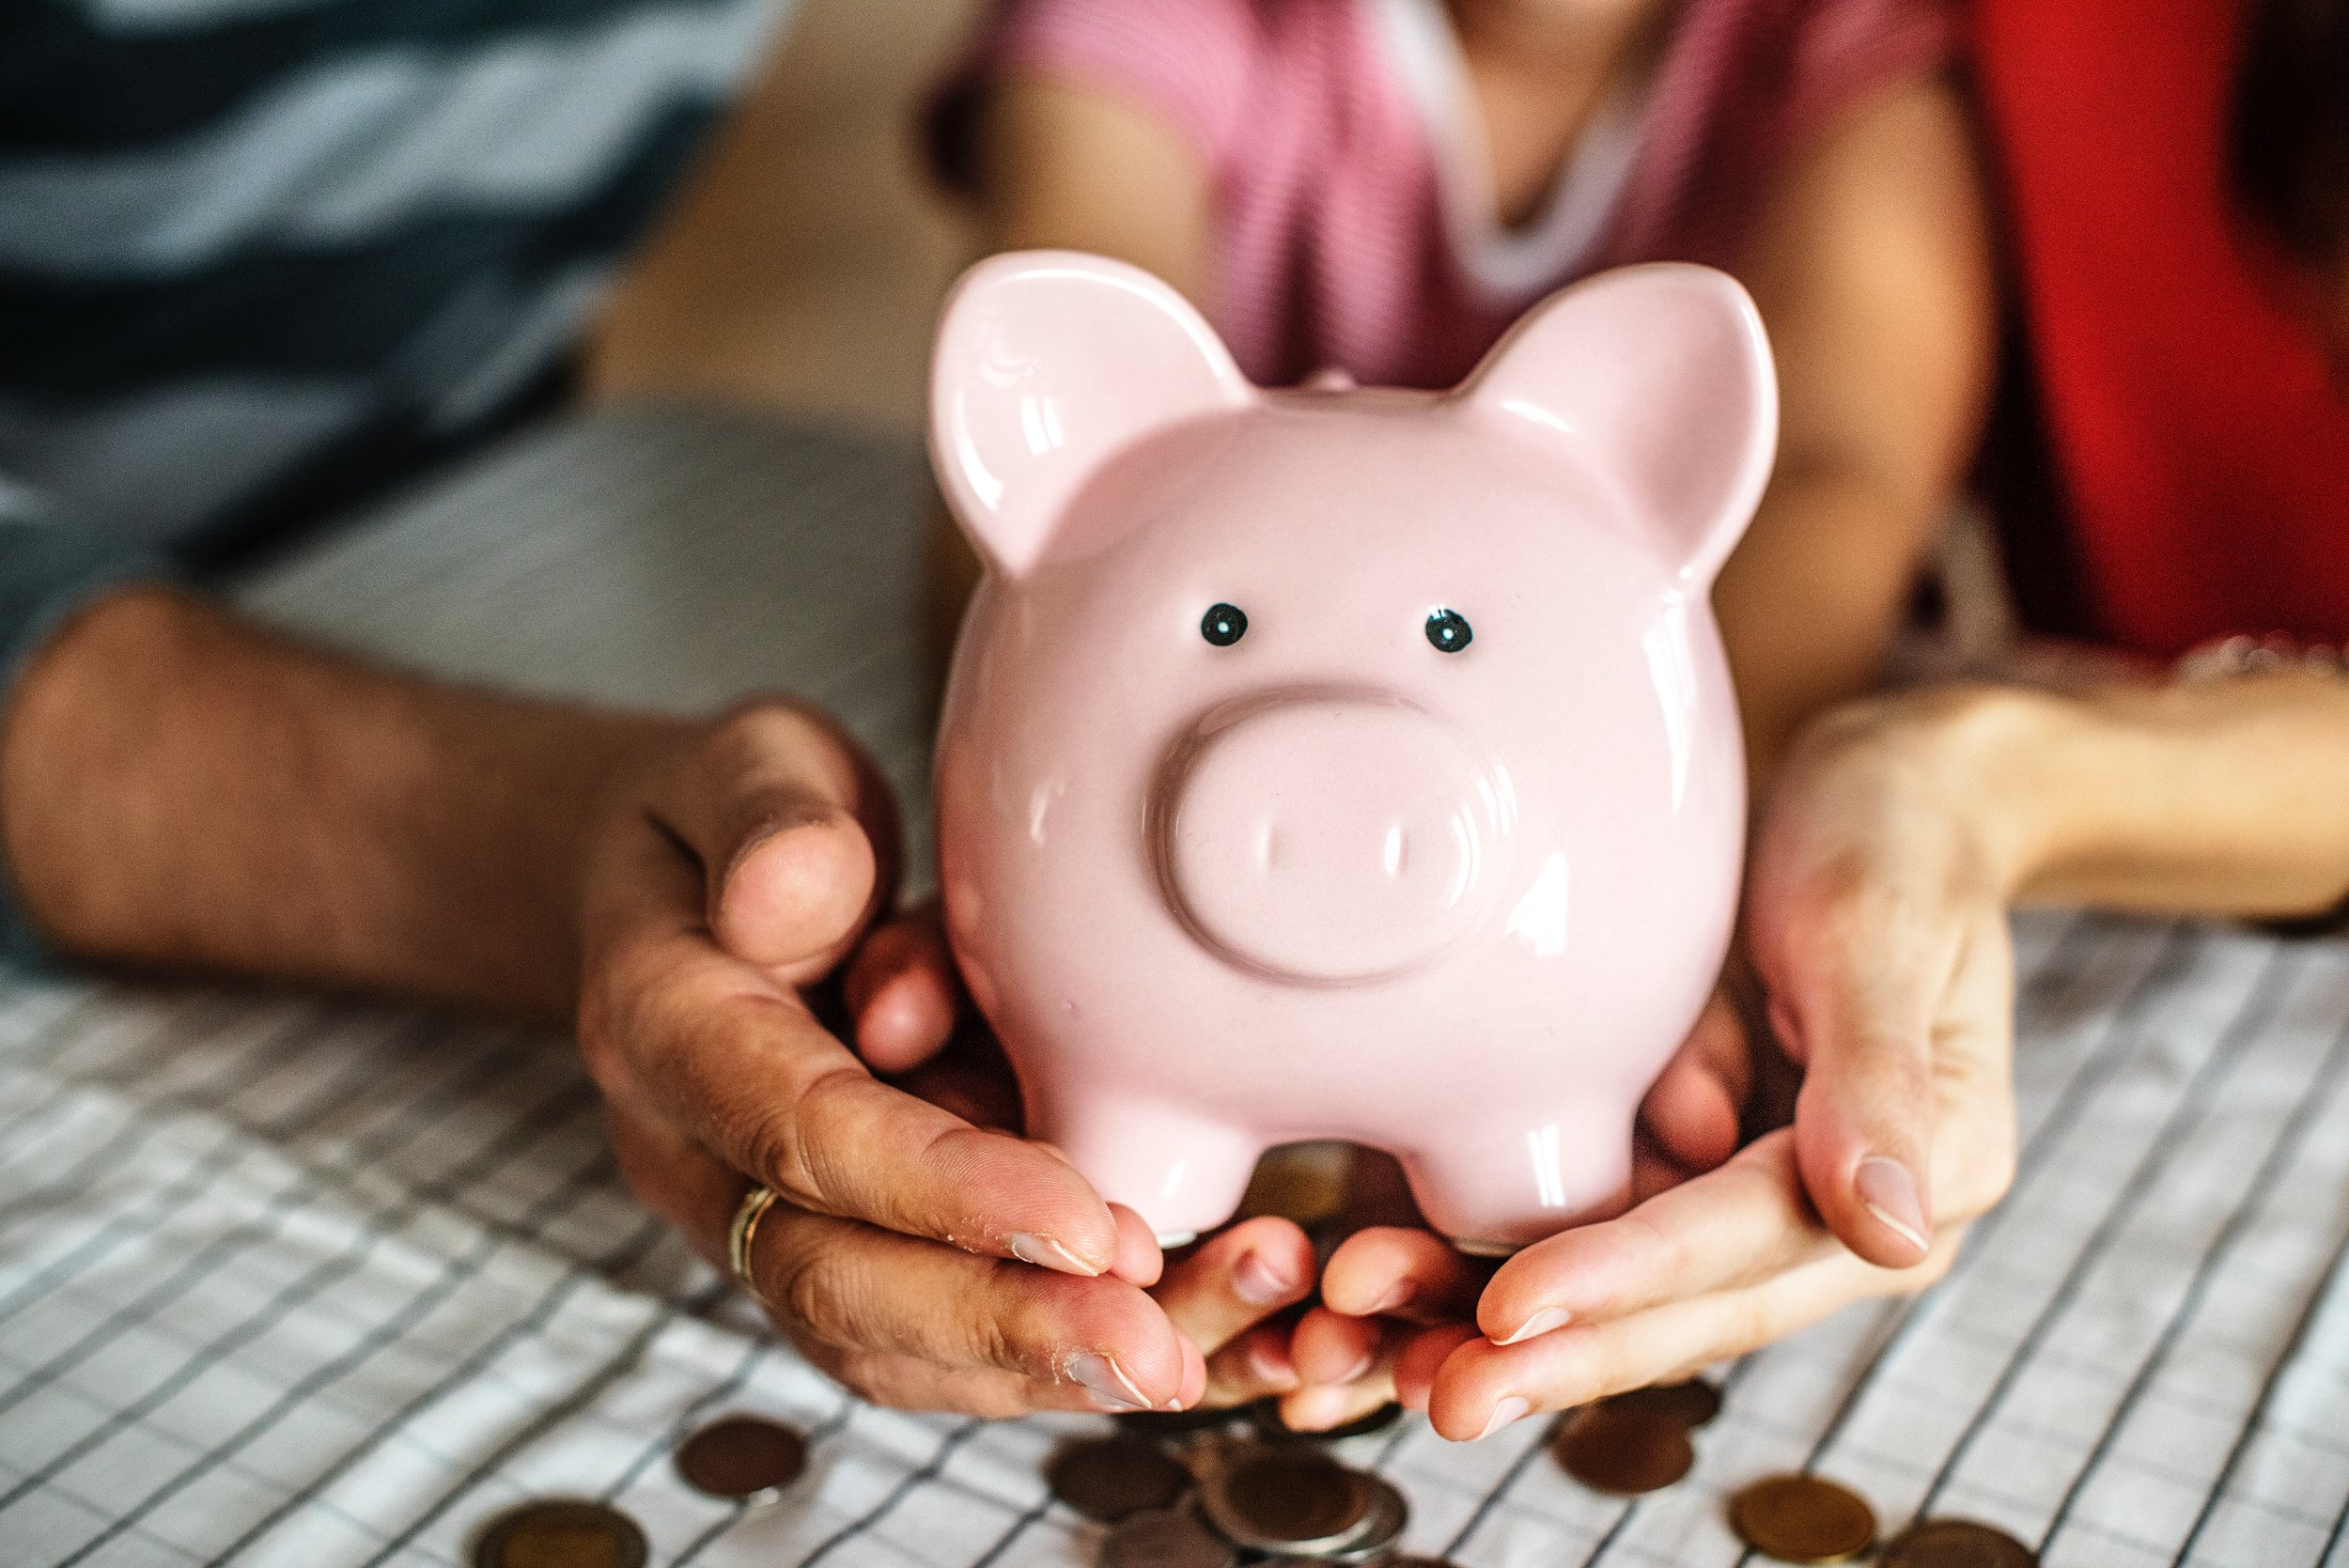 cash-cent-child-1246954 (3).jpg